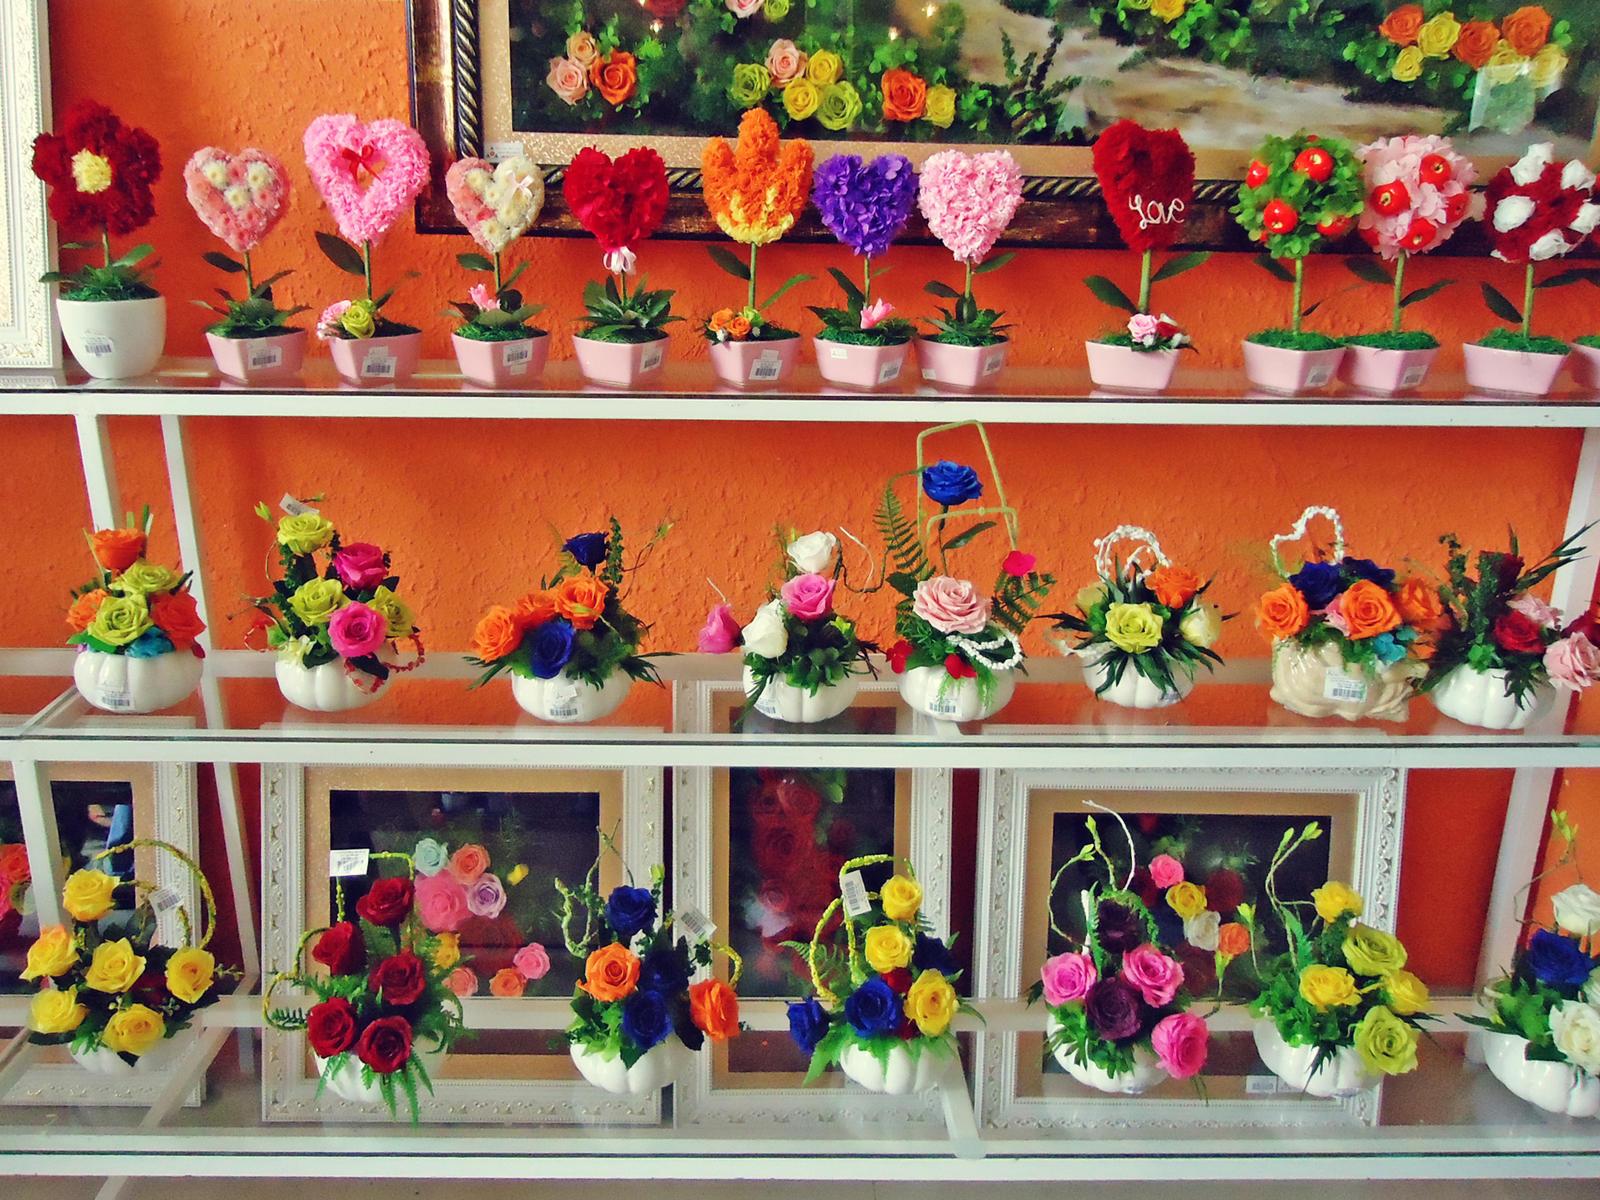 Snap Flower Shop By Lmsr On Deviantart Photos On Pinterest